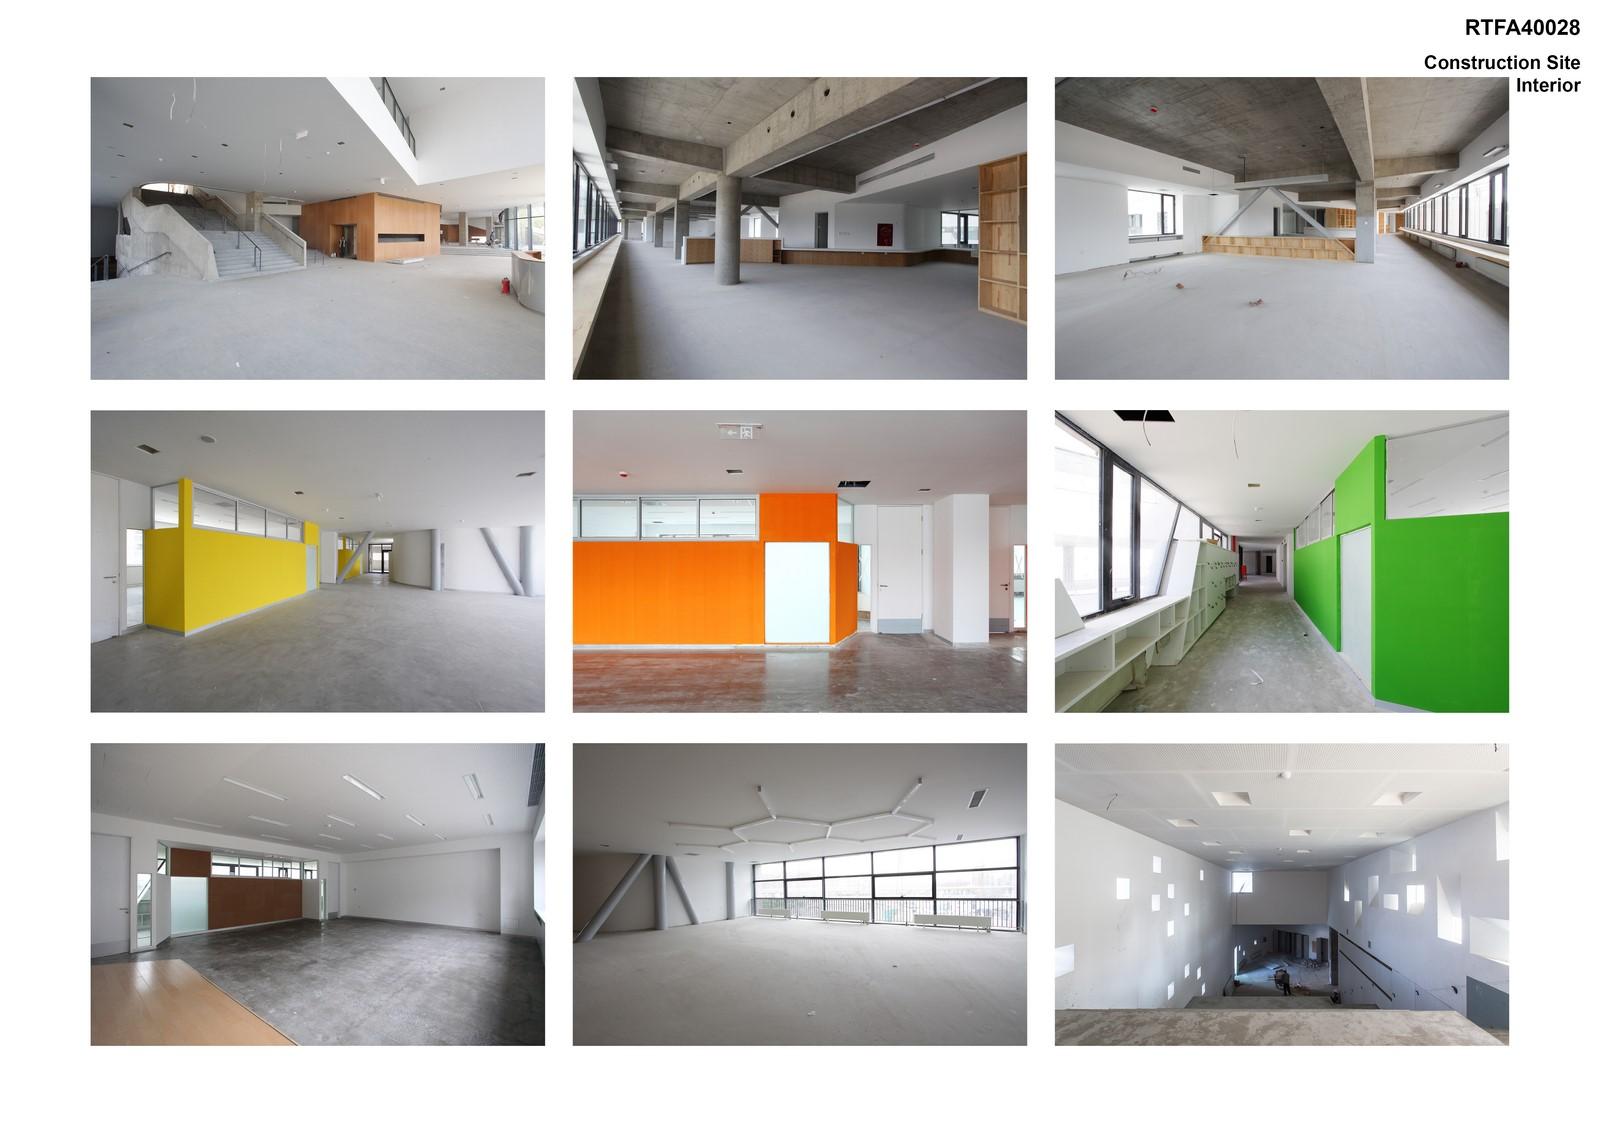 Garden School By Open Architecture - Sheet5